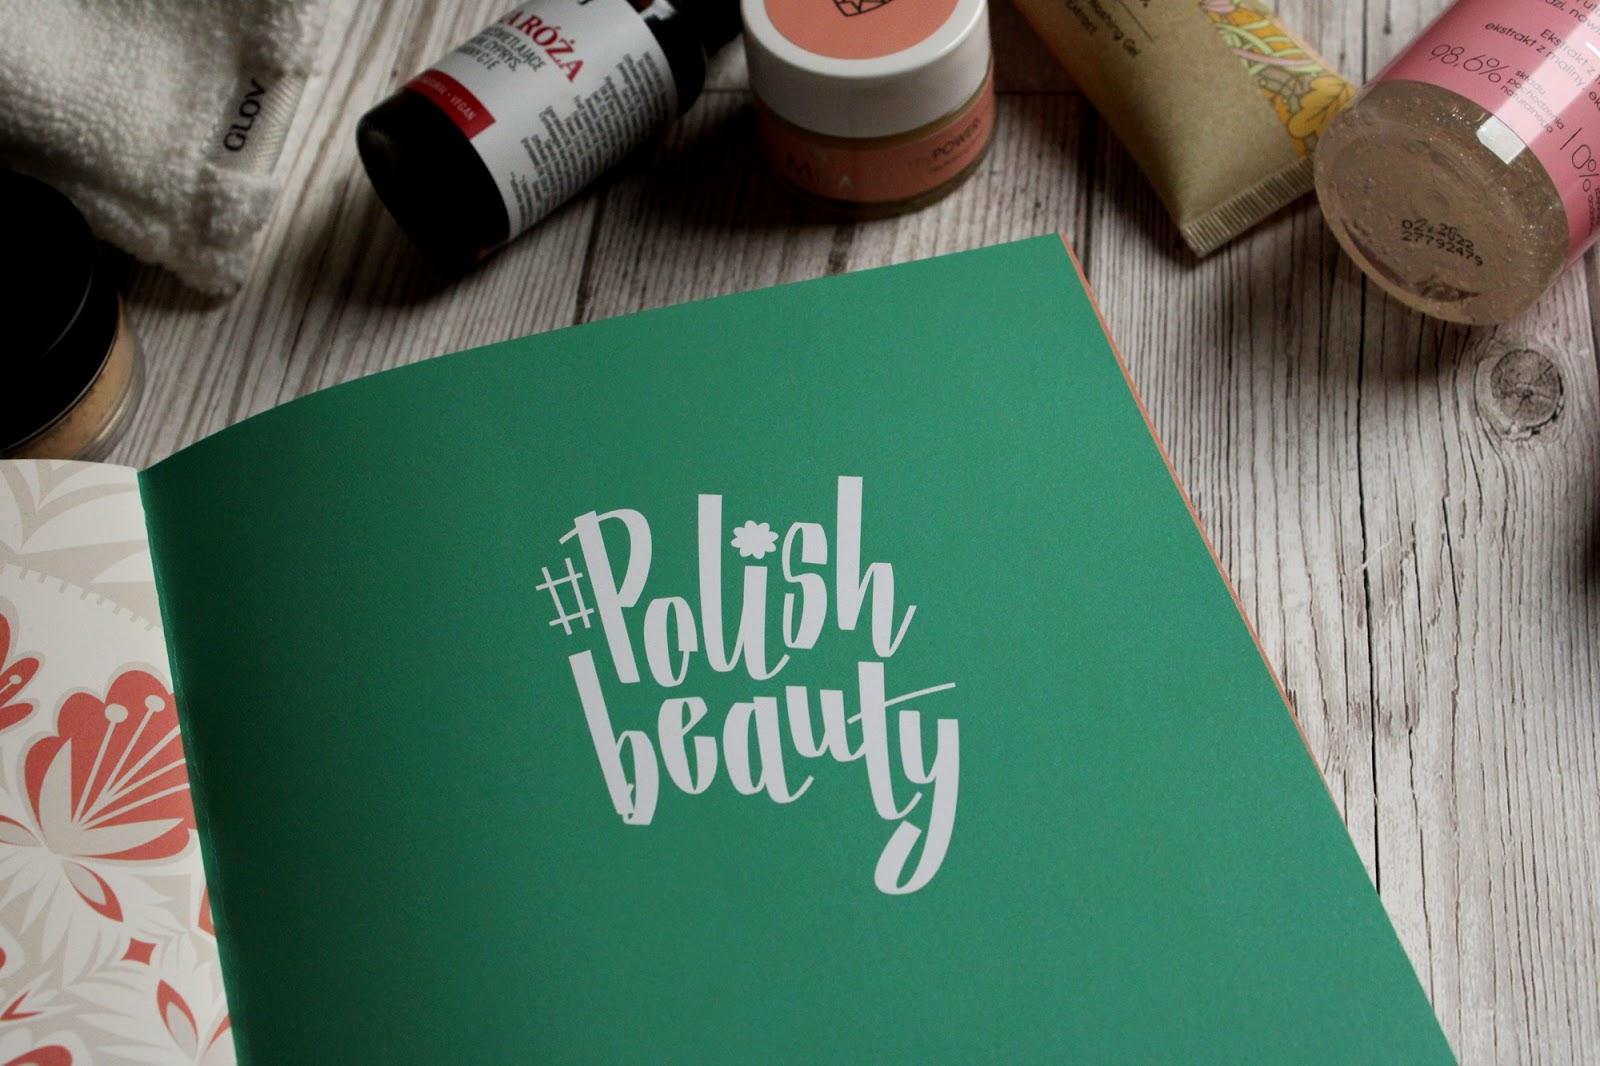 Polish beauty. Poradnik naturalnego piękna dla polek.